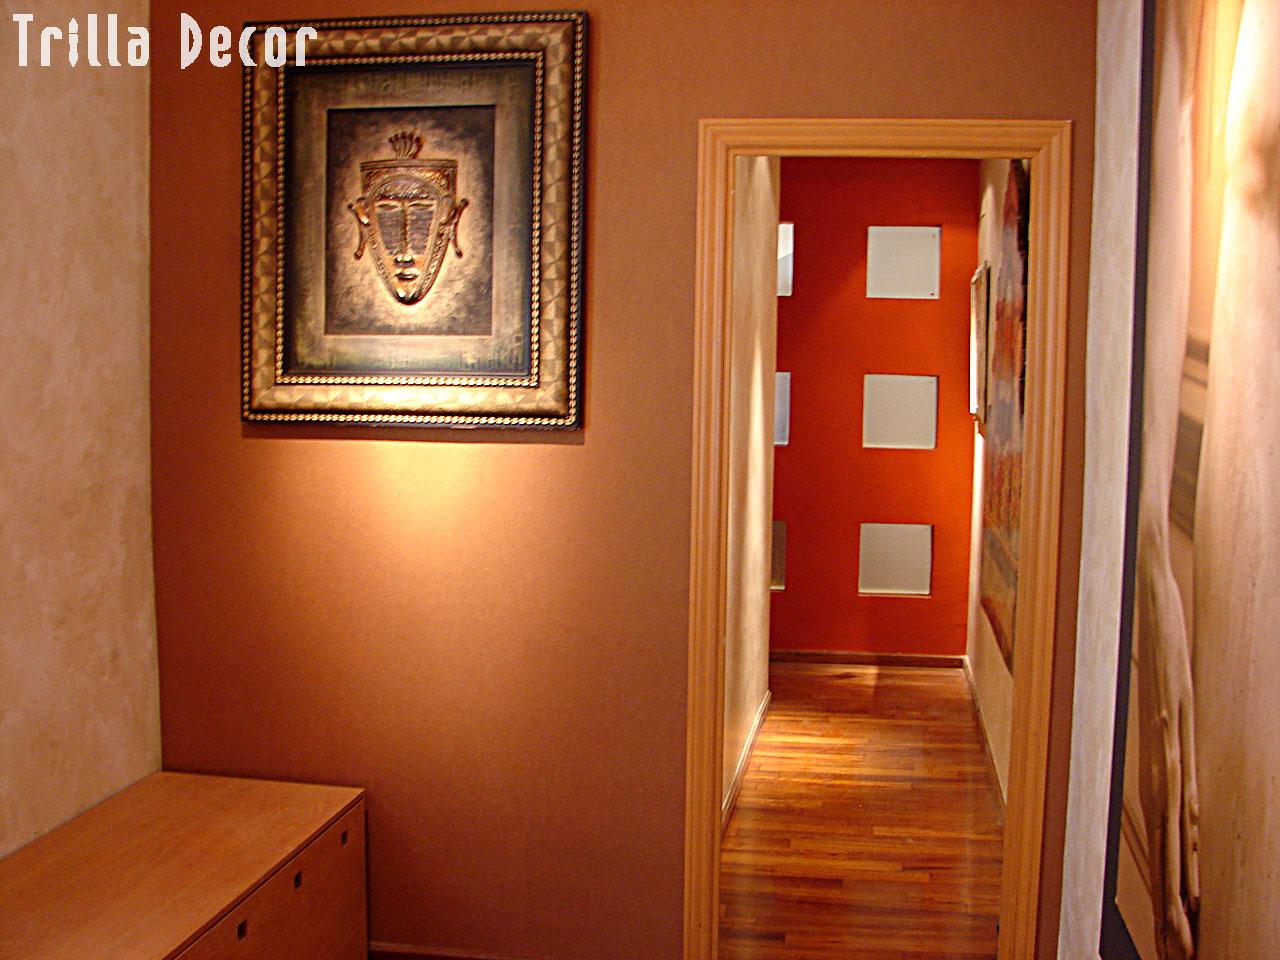 Papel pintado color marr n for Papel pintado color marron